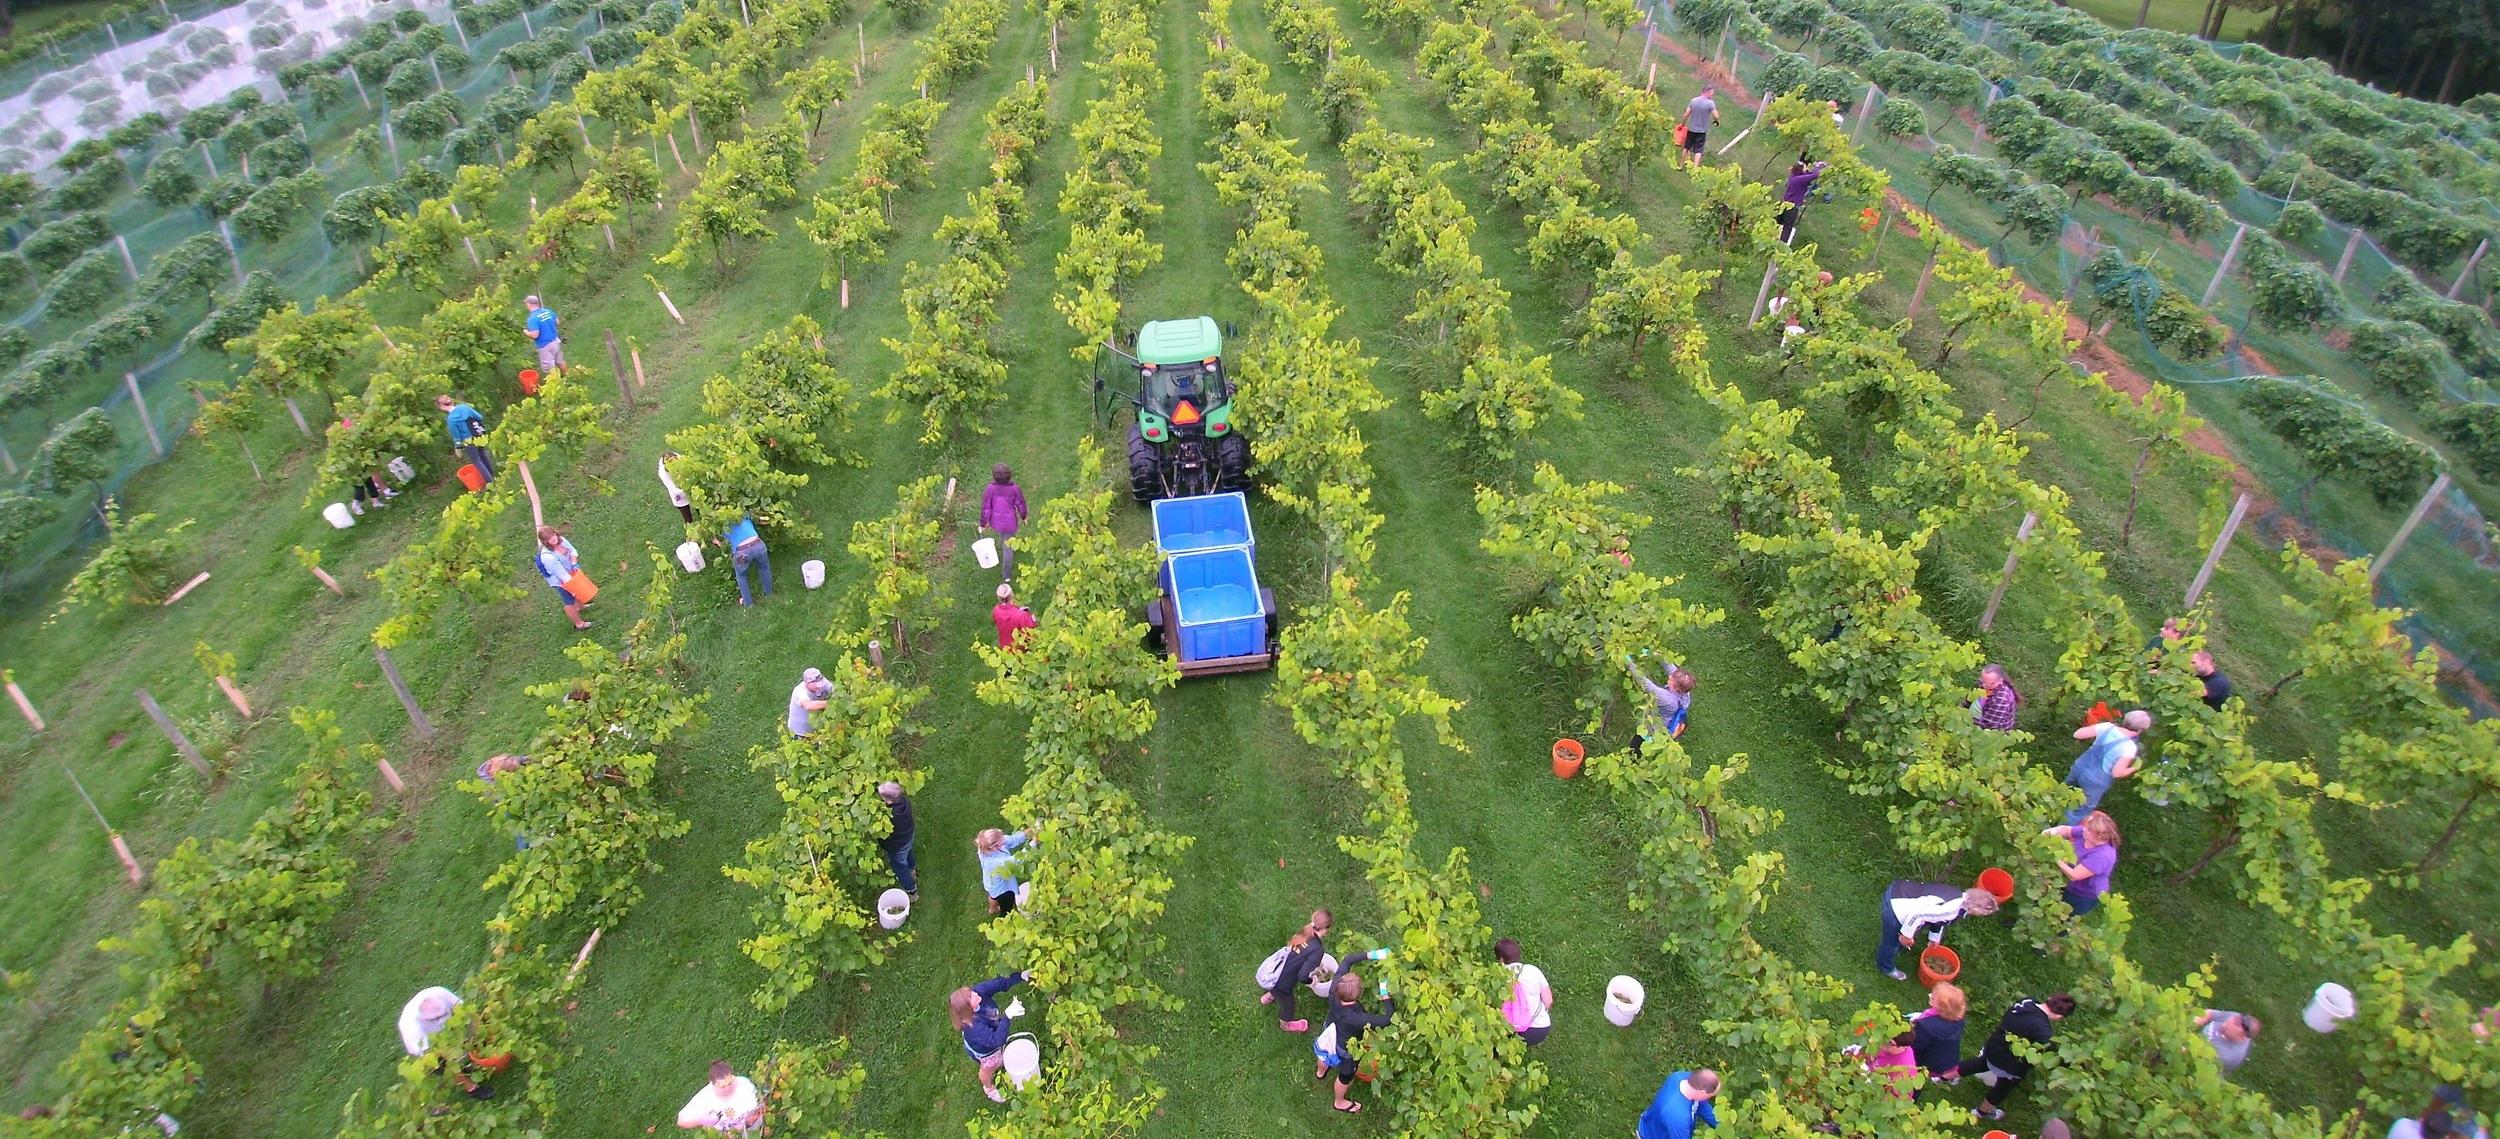 Summerset Winery Harvest Drone 2.jpg